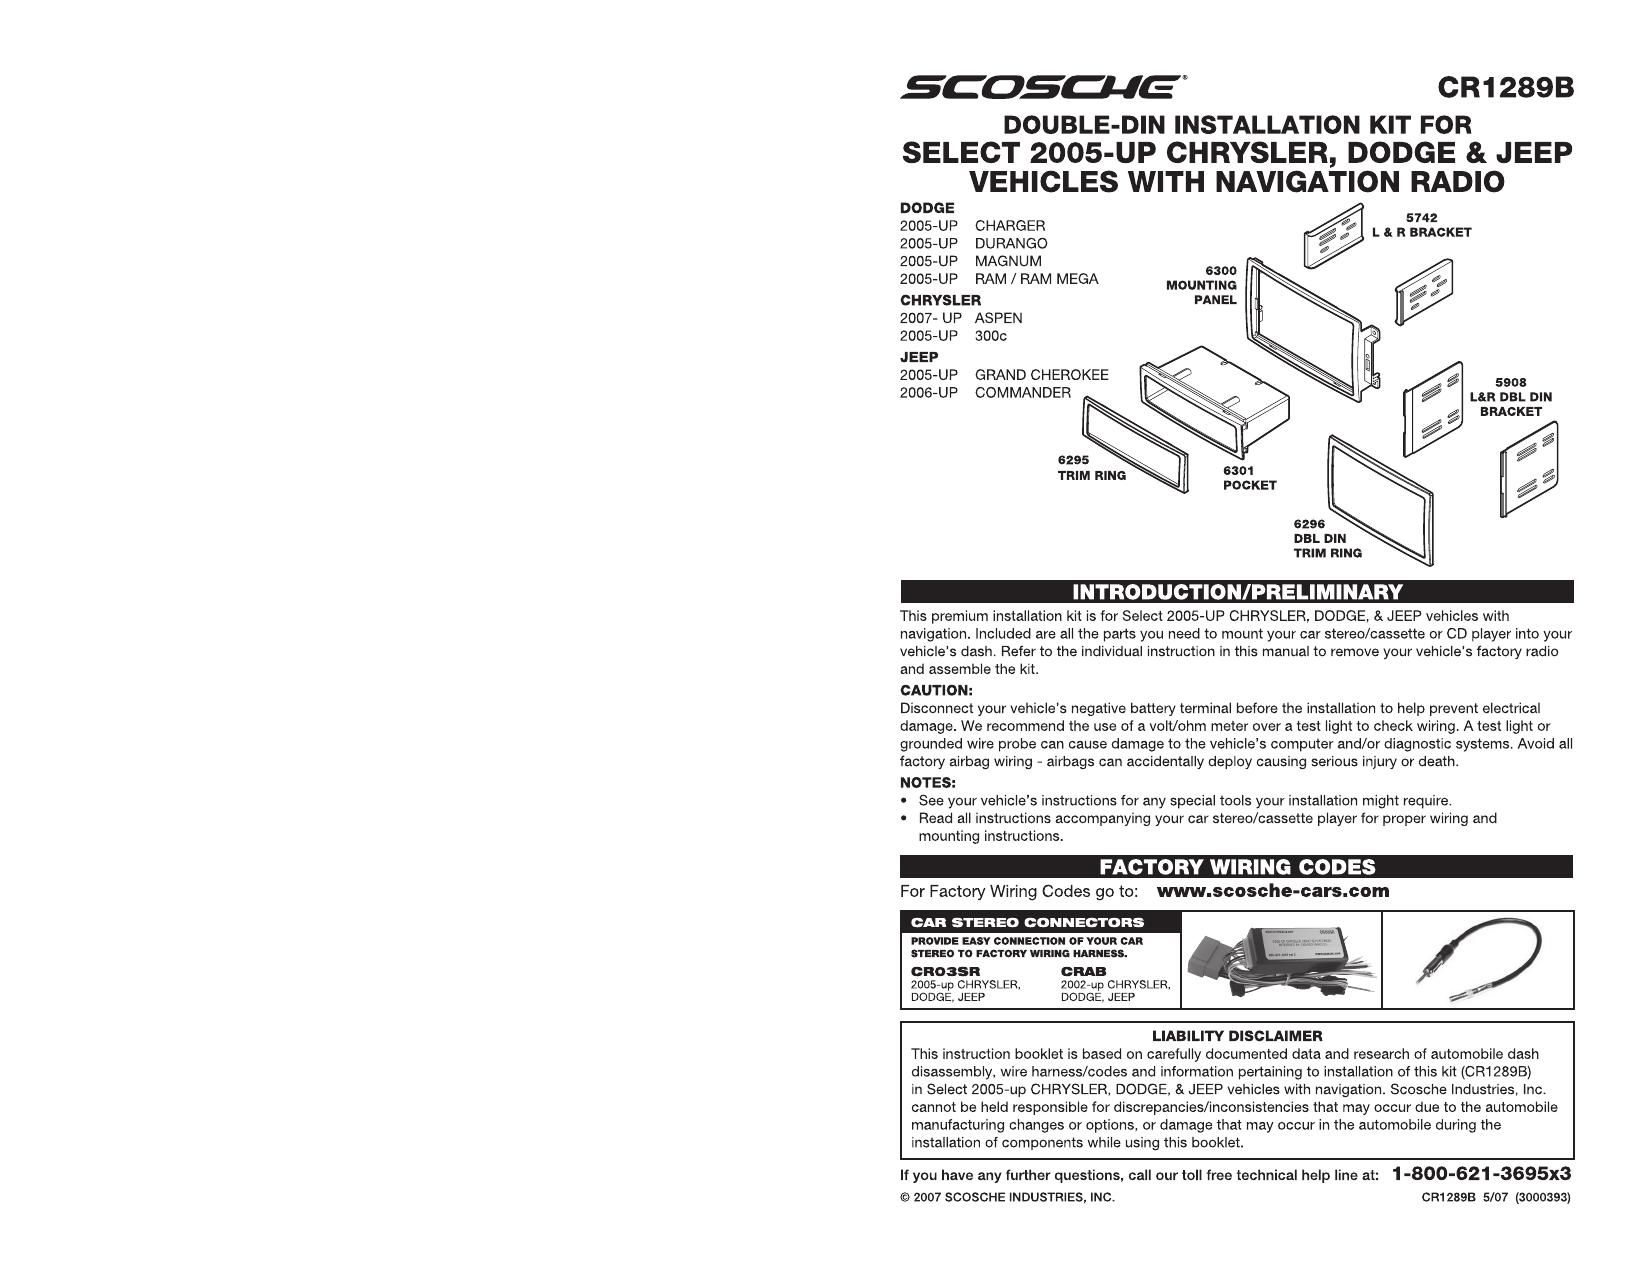 SCOSCHE CR05B 2002-07 Select Chrysler//Dodge Amp Integration Harness